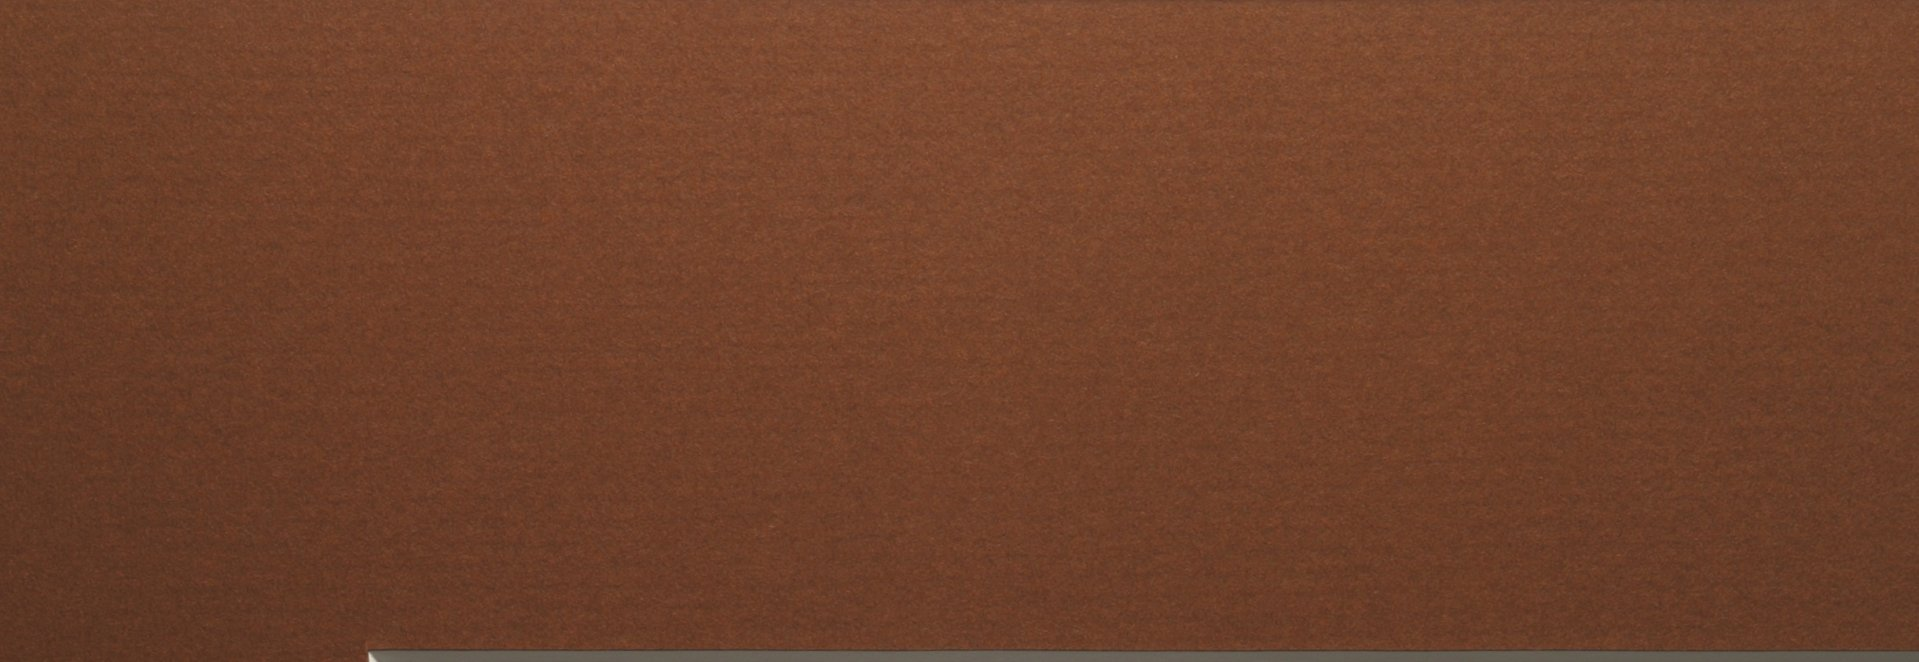 SRM1040 Classic Brown